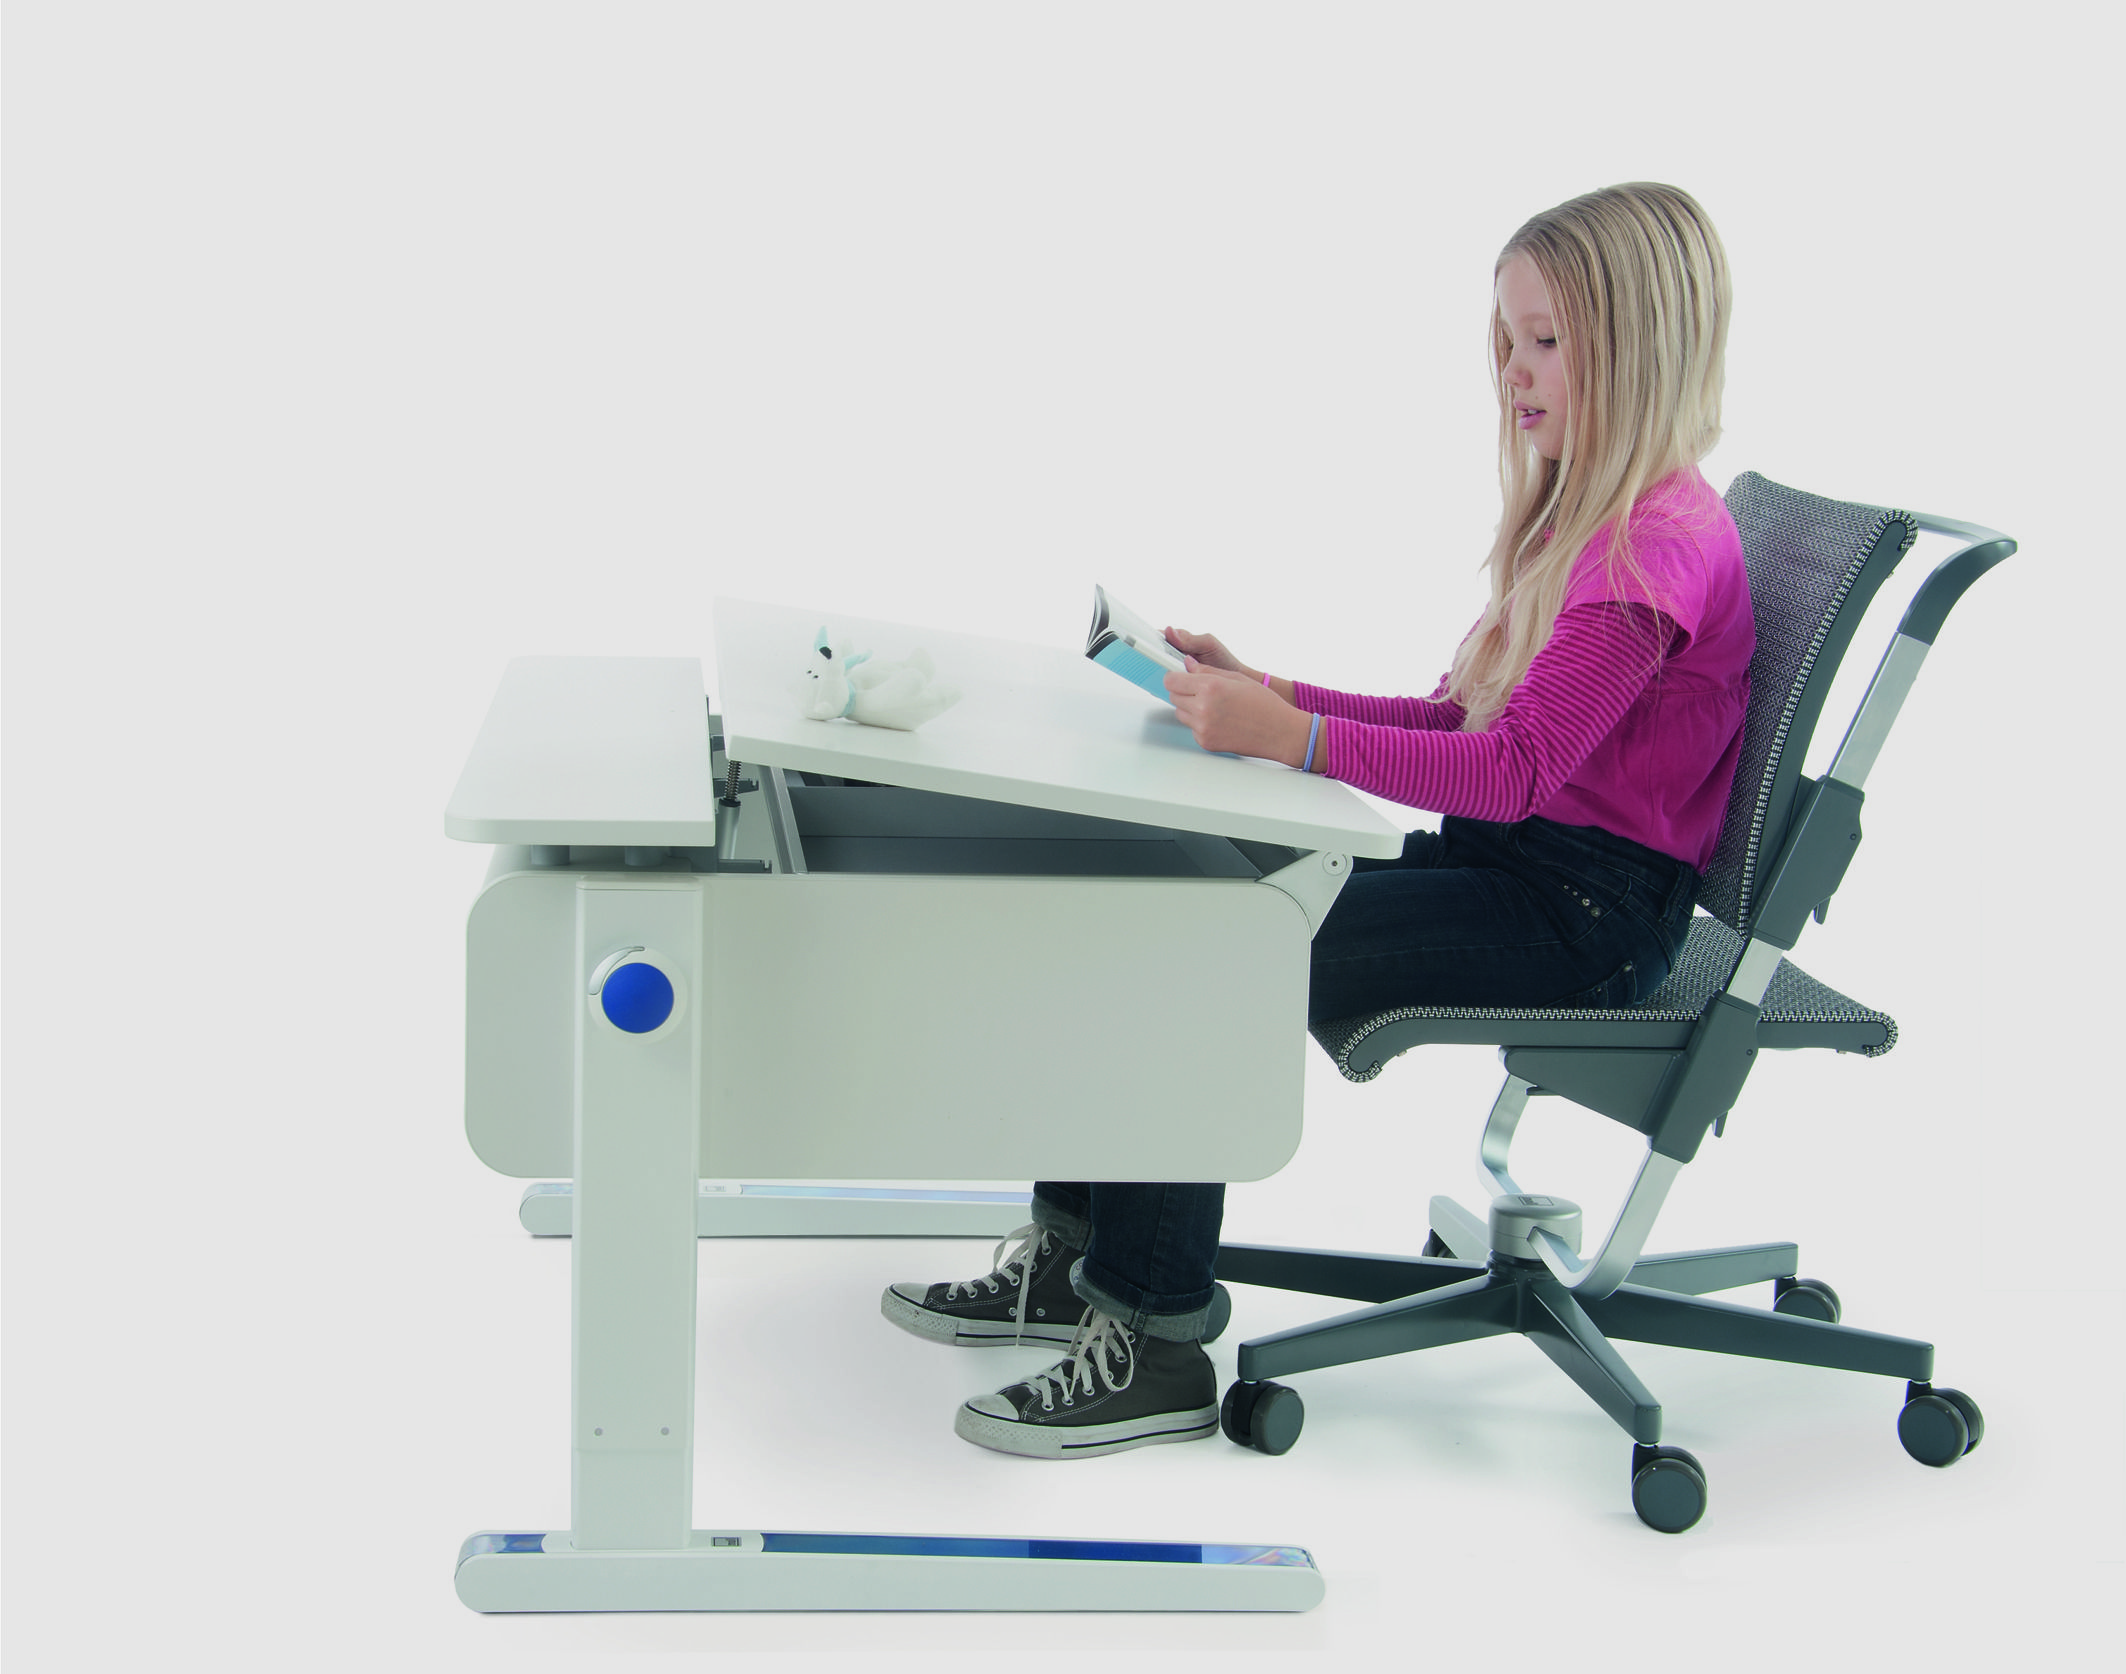 moll Champion ergonomic study desk for kids teens and grown ups